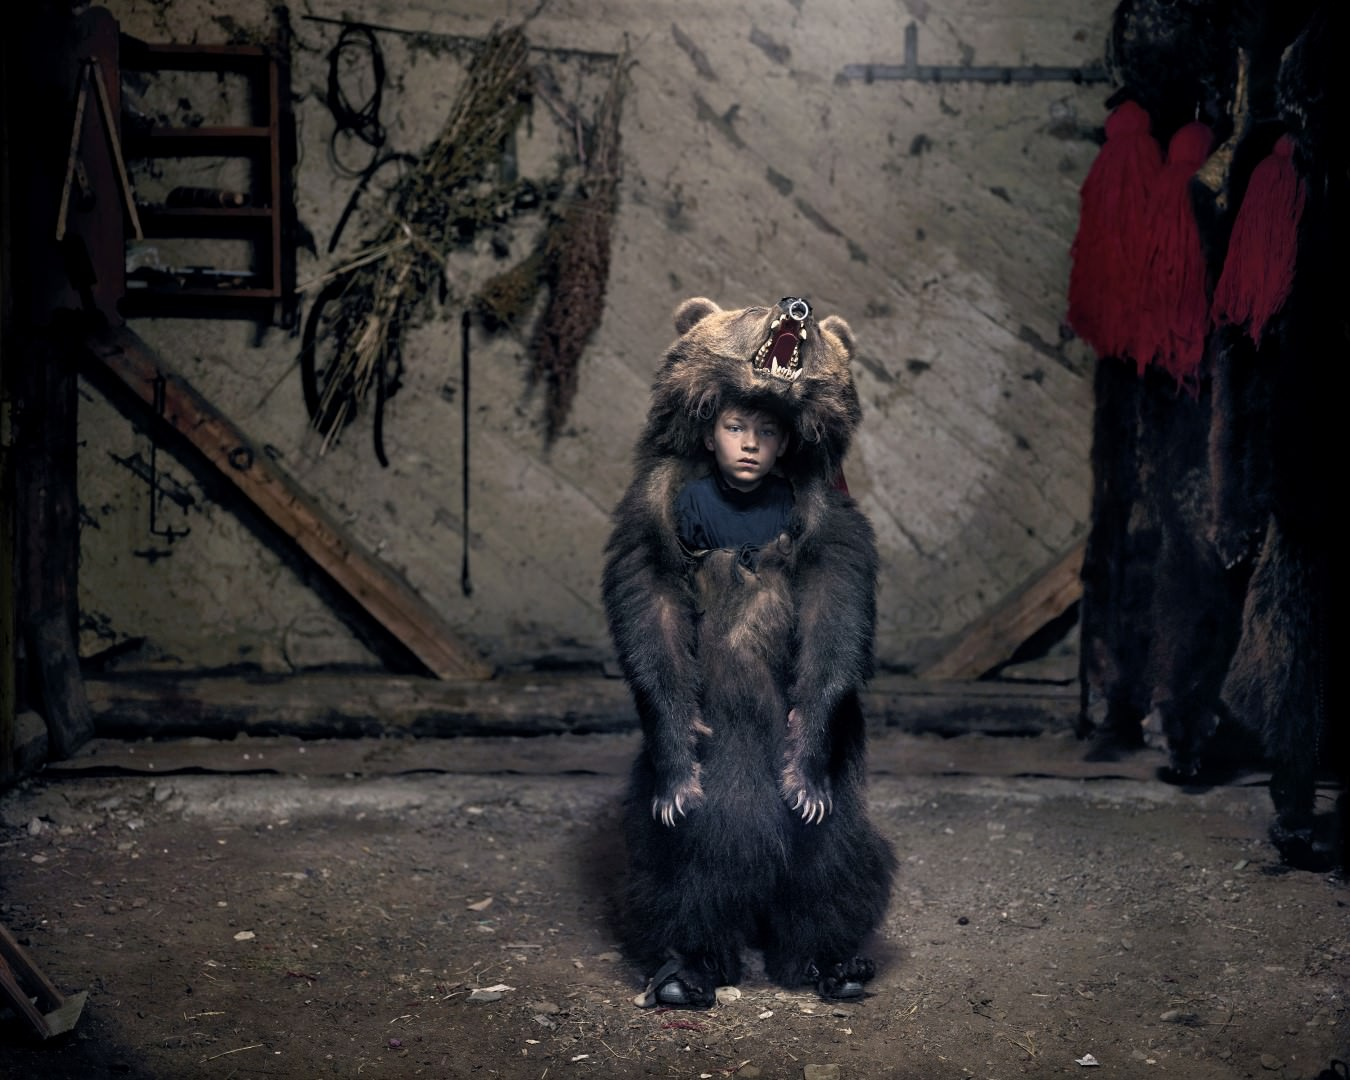 Dezső Tamás, Ciprian a medvetáncos – Salatruc, Kelet-Románia I Ciprian, the Bear Dancer (Salatruc, East Romania), 2013 © Tamas Dezso